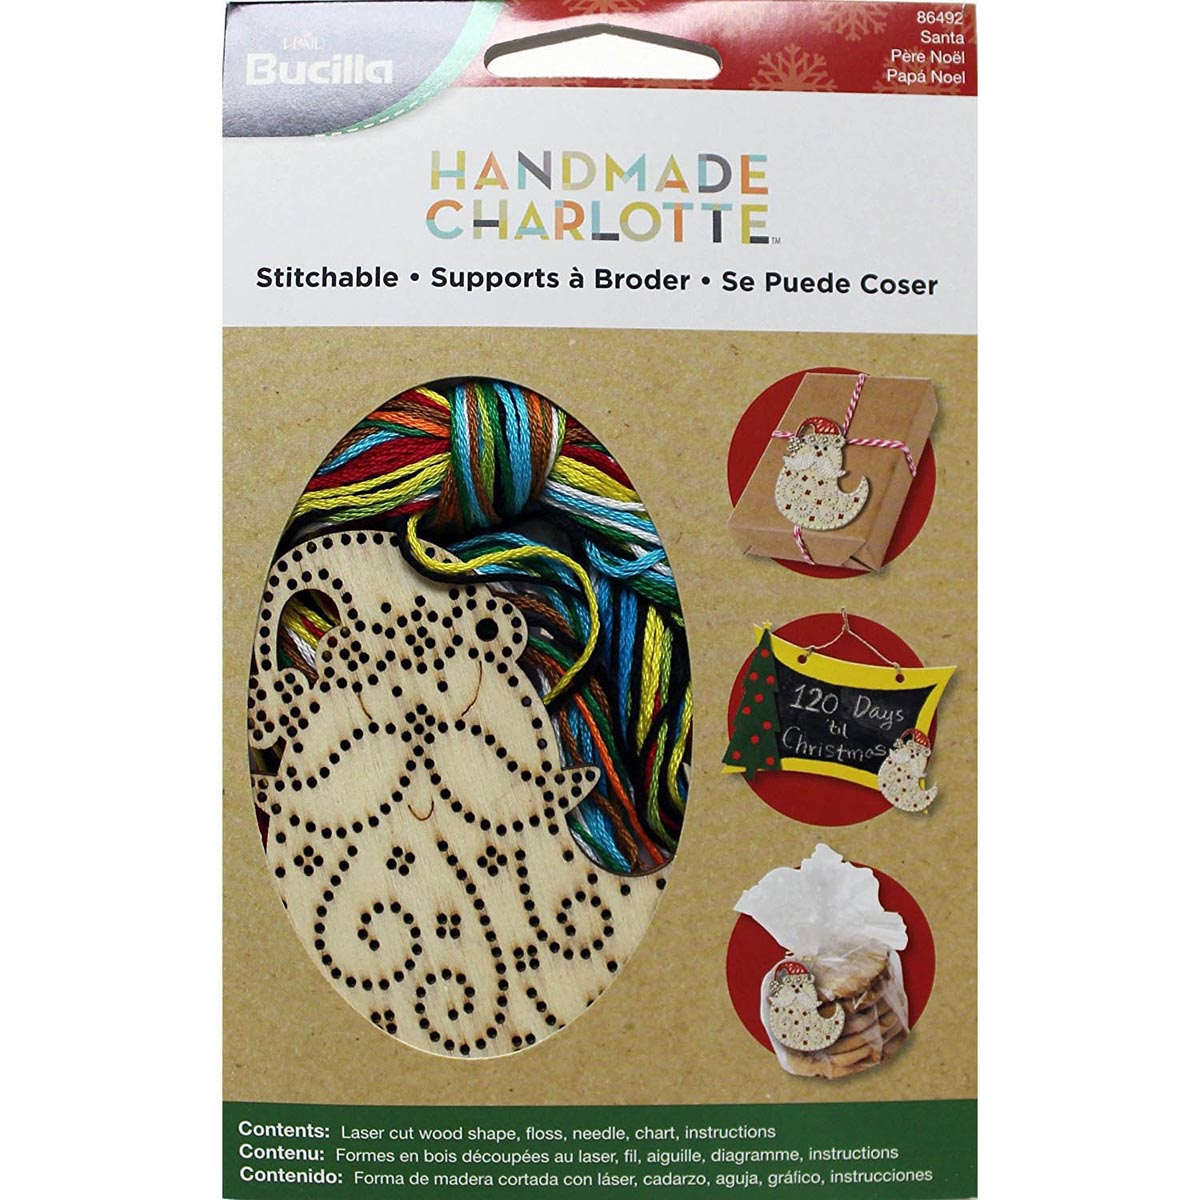 Bucilla ® Seasonal Handmade Charlotte™ Wood Stitchables - Santa